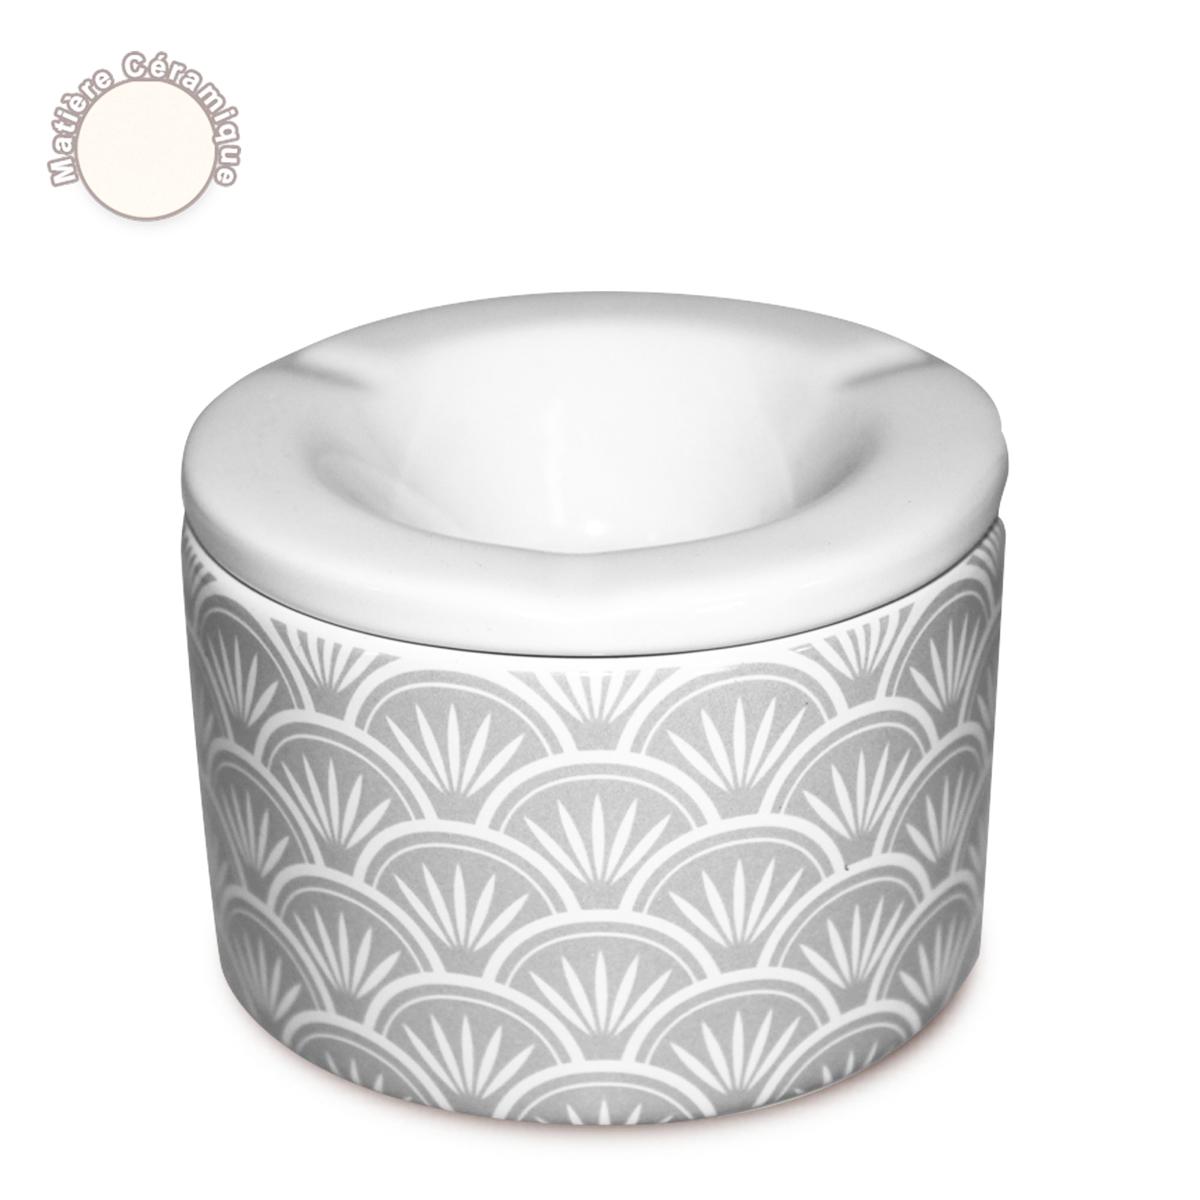 Cendrier marocain céramique \'Boho\' gris (éventails) - 10x7 cm - [A0562]